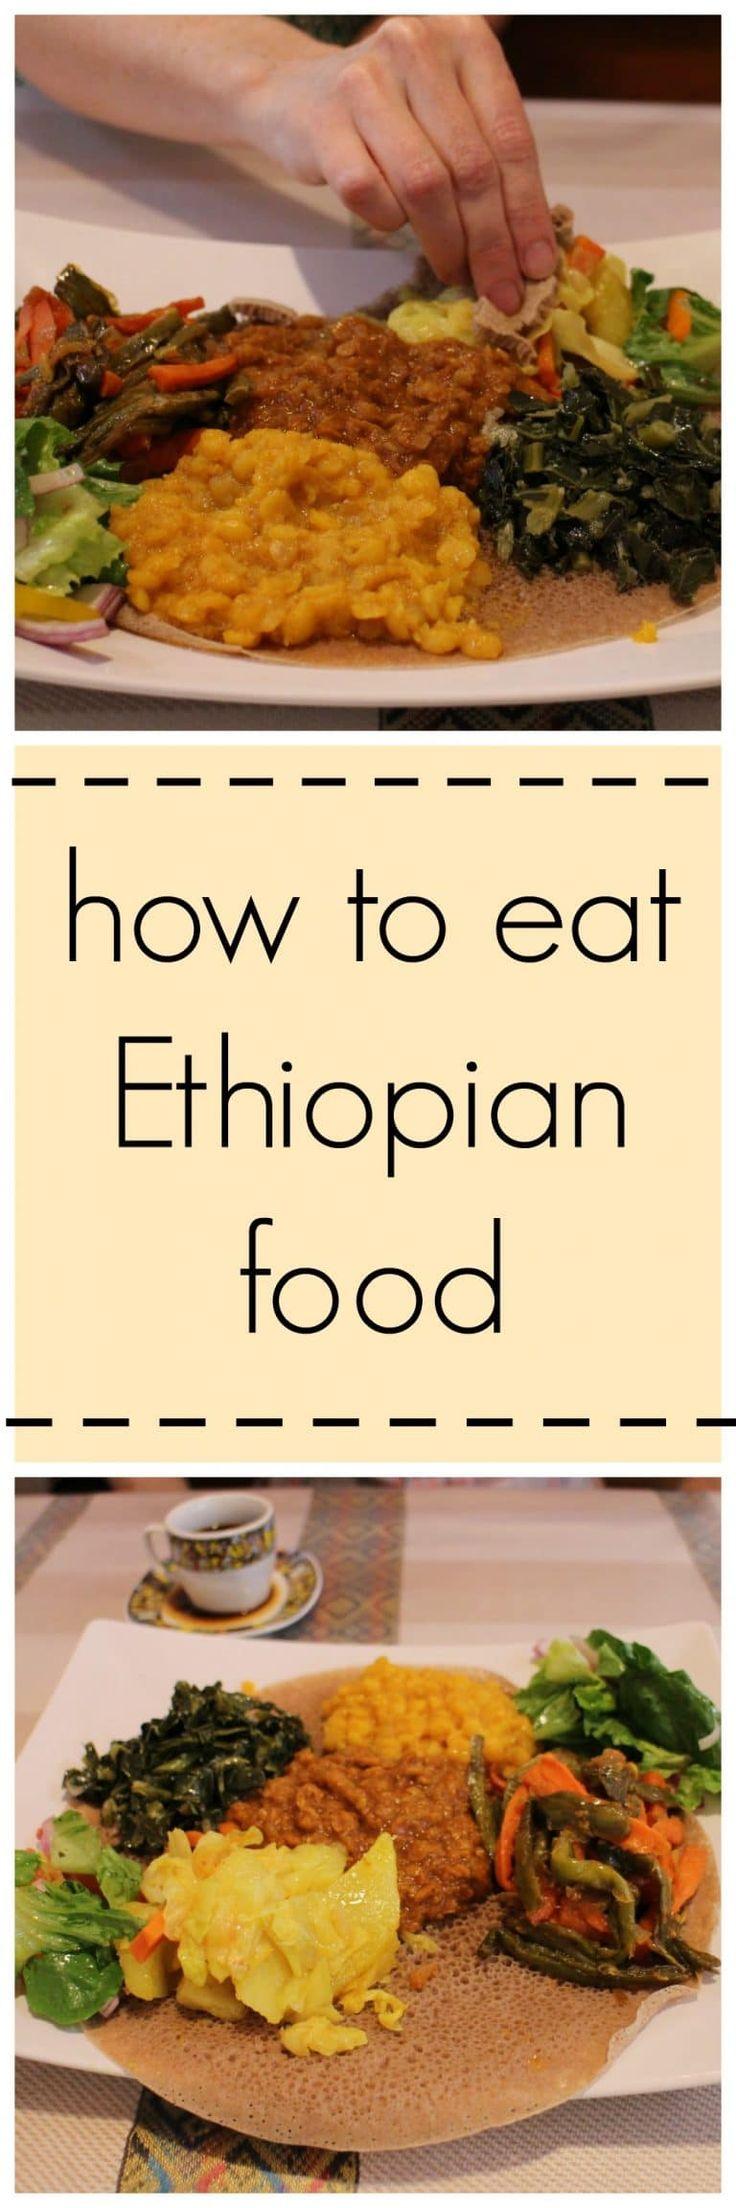 How to eat Ethiopian food + Nile Ethiopian restaurant in Coralville, Iowa. Lots of vegan options! | cadryskitchen.com